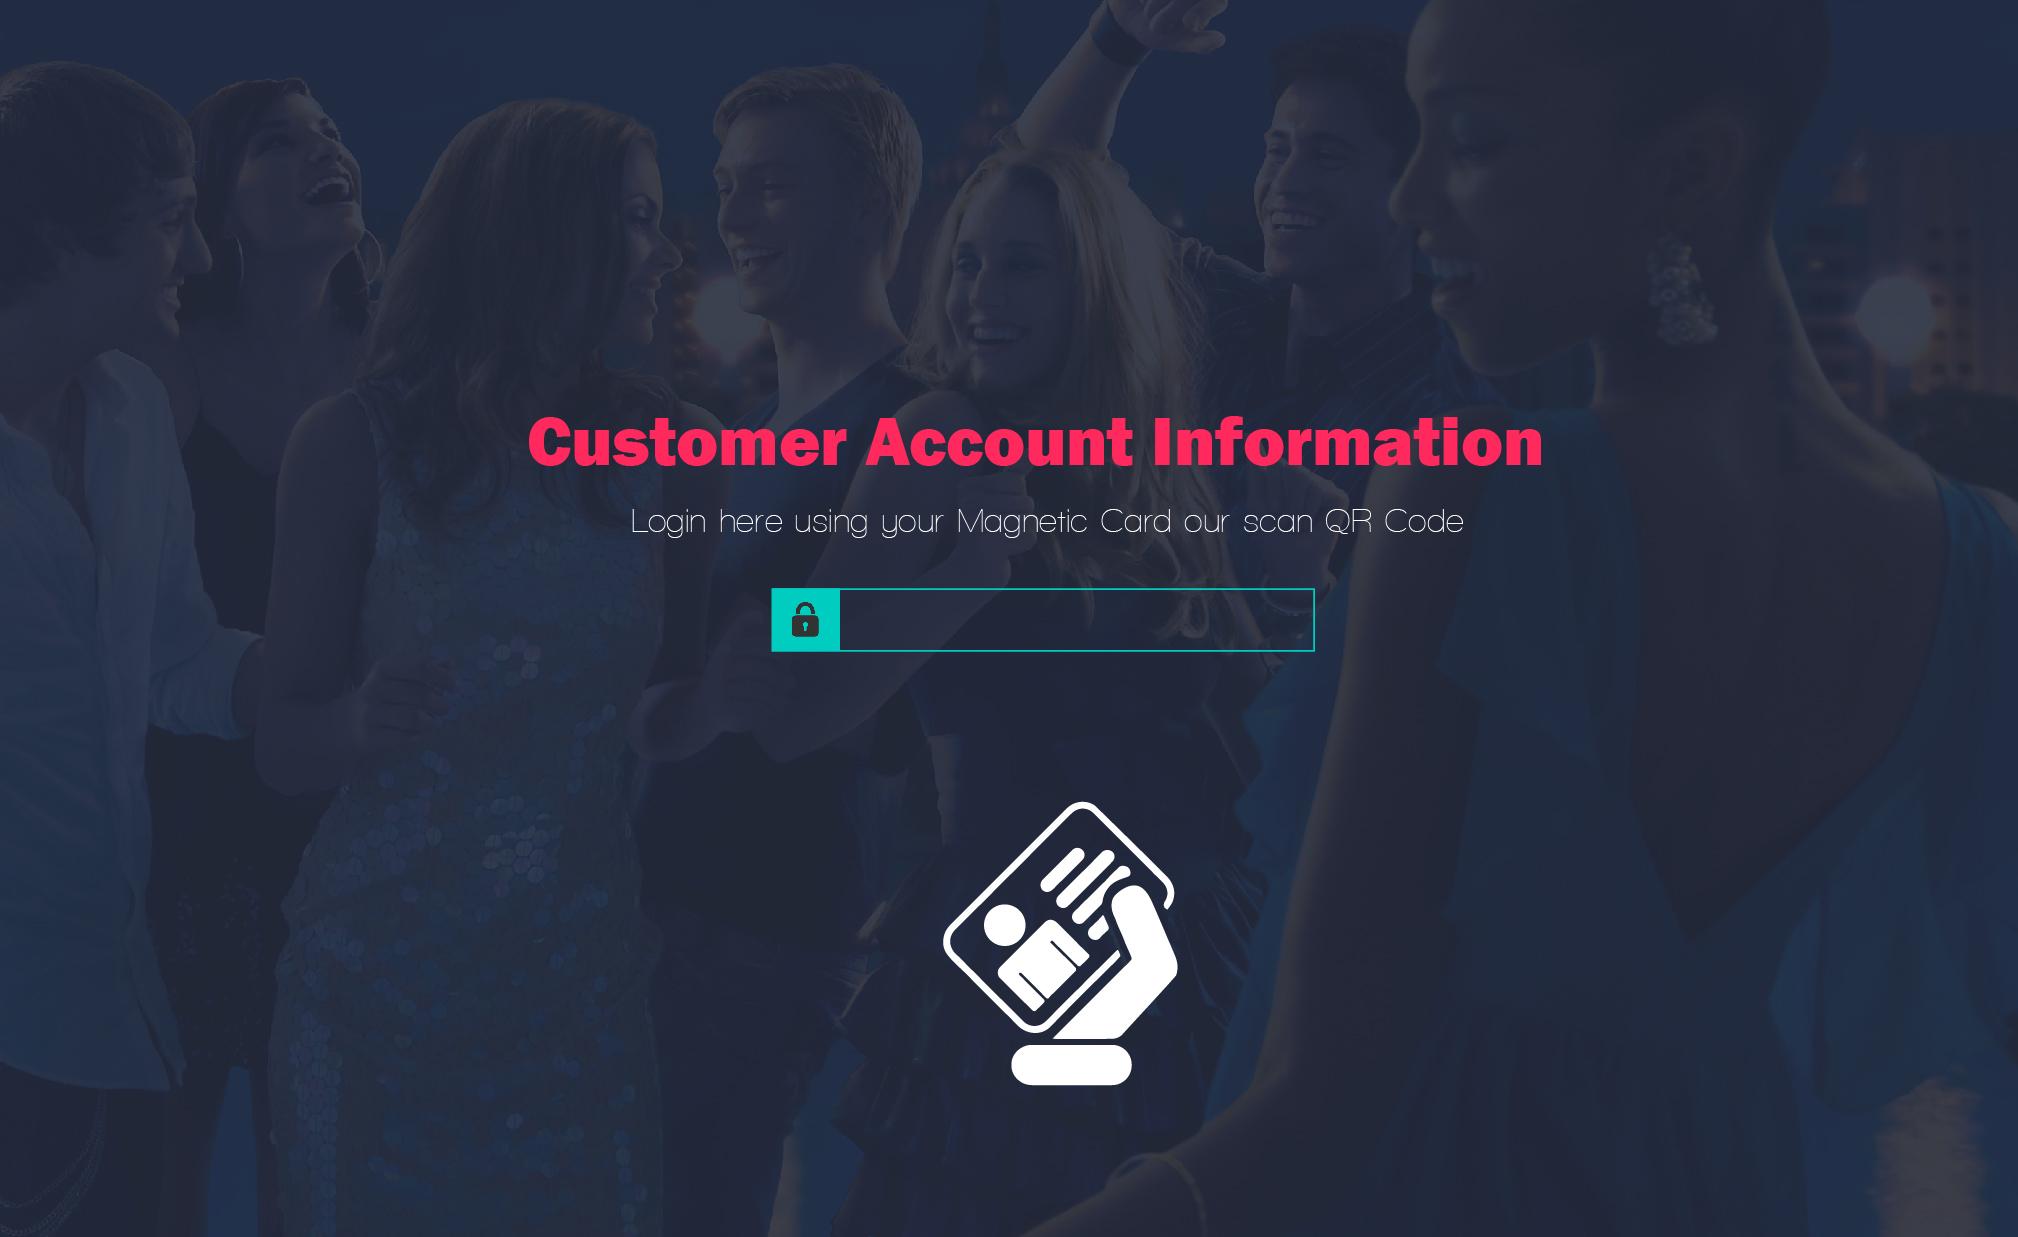 Customer/account/login - Login Page Account Customers 2b Jpg2018x1237 601 Kb